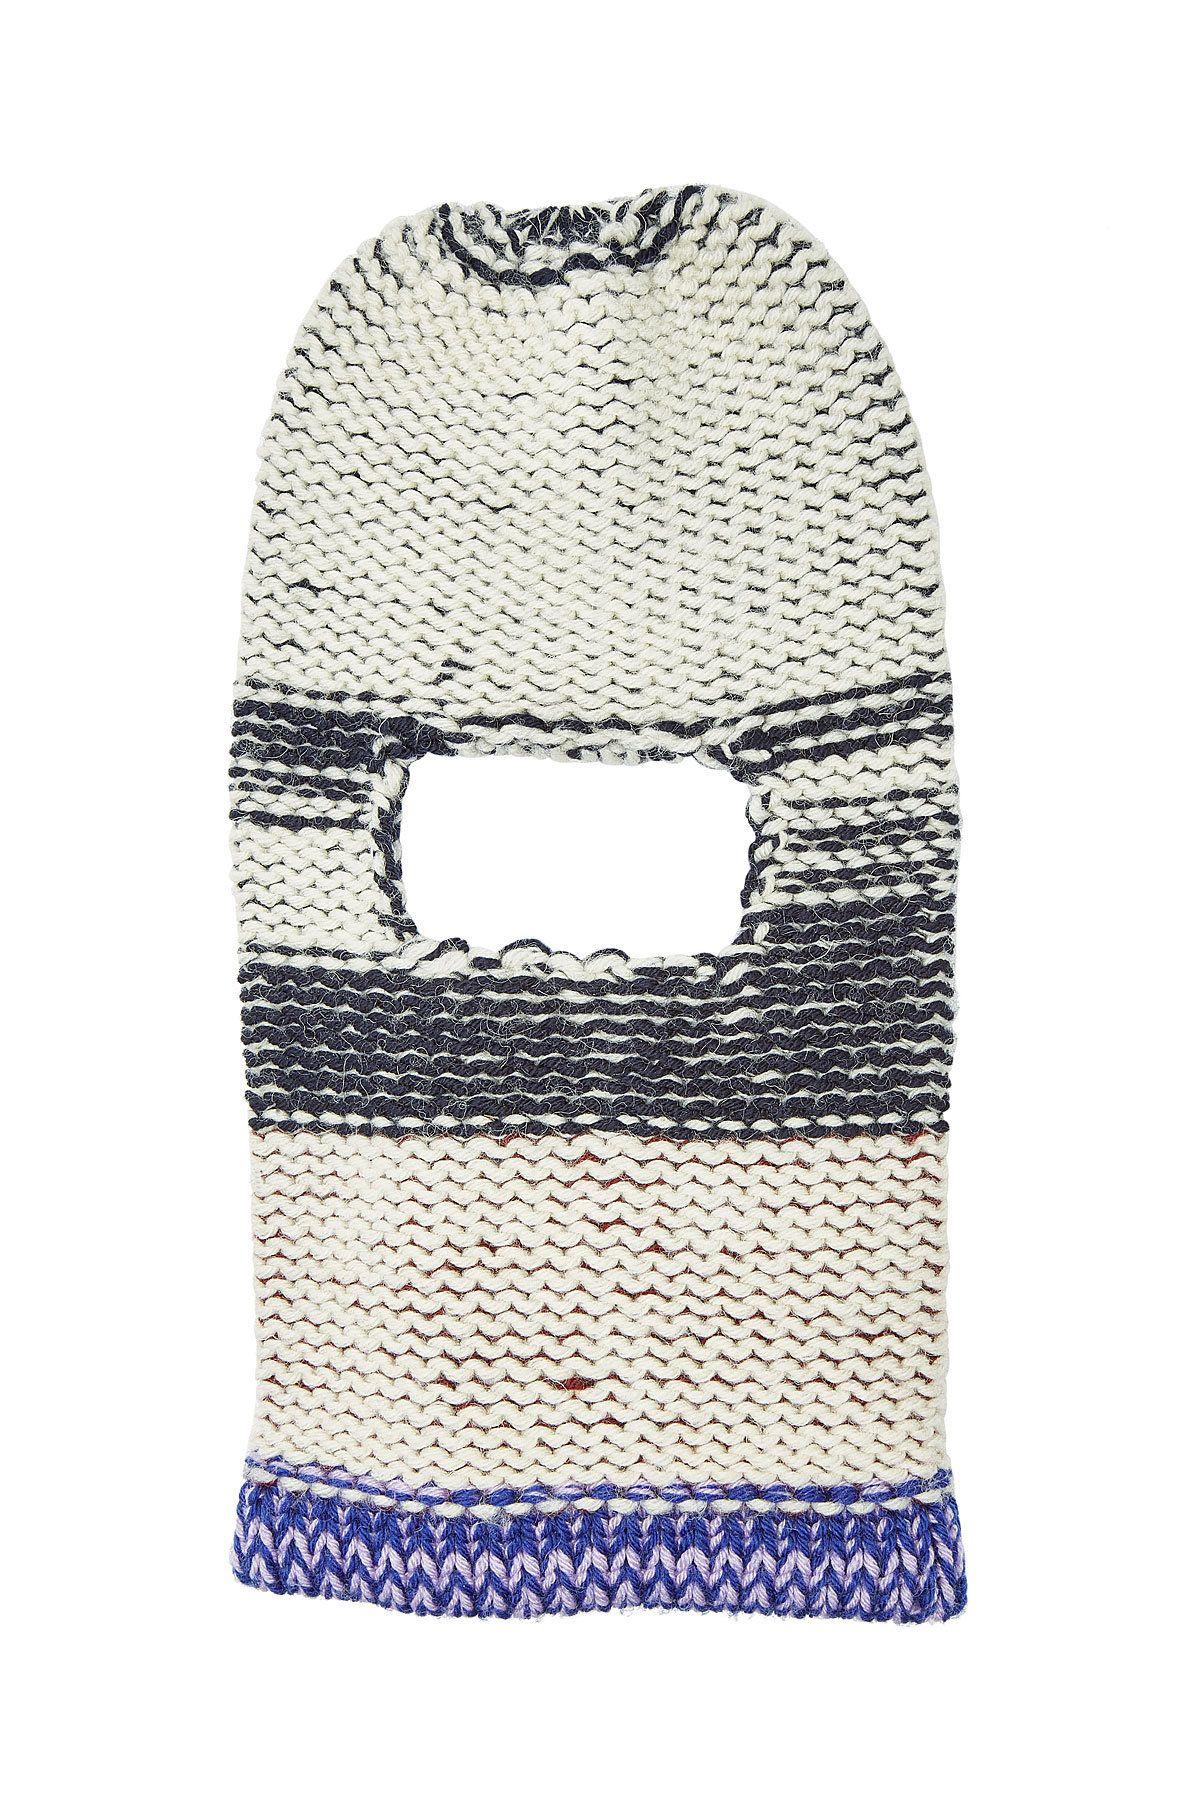 184d3ab0c20 CALVIN KLEIN 205W39NYC - Virgin Wool Hat on STYLEBOP.com